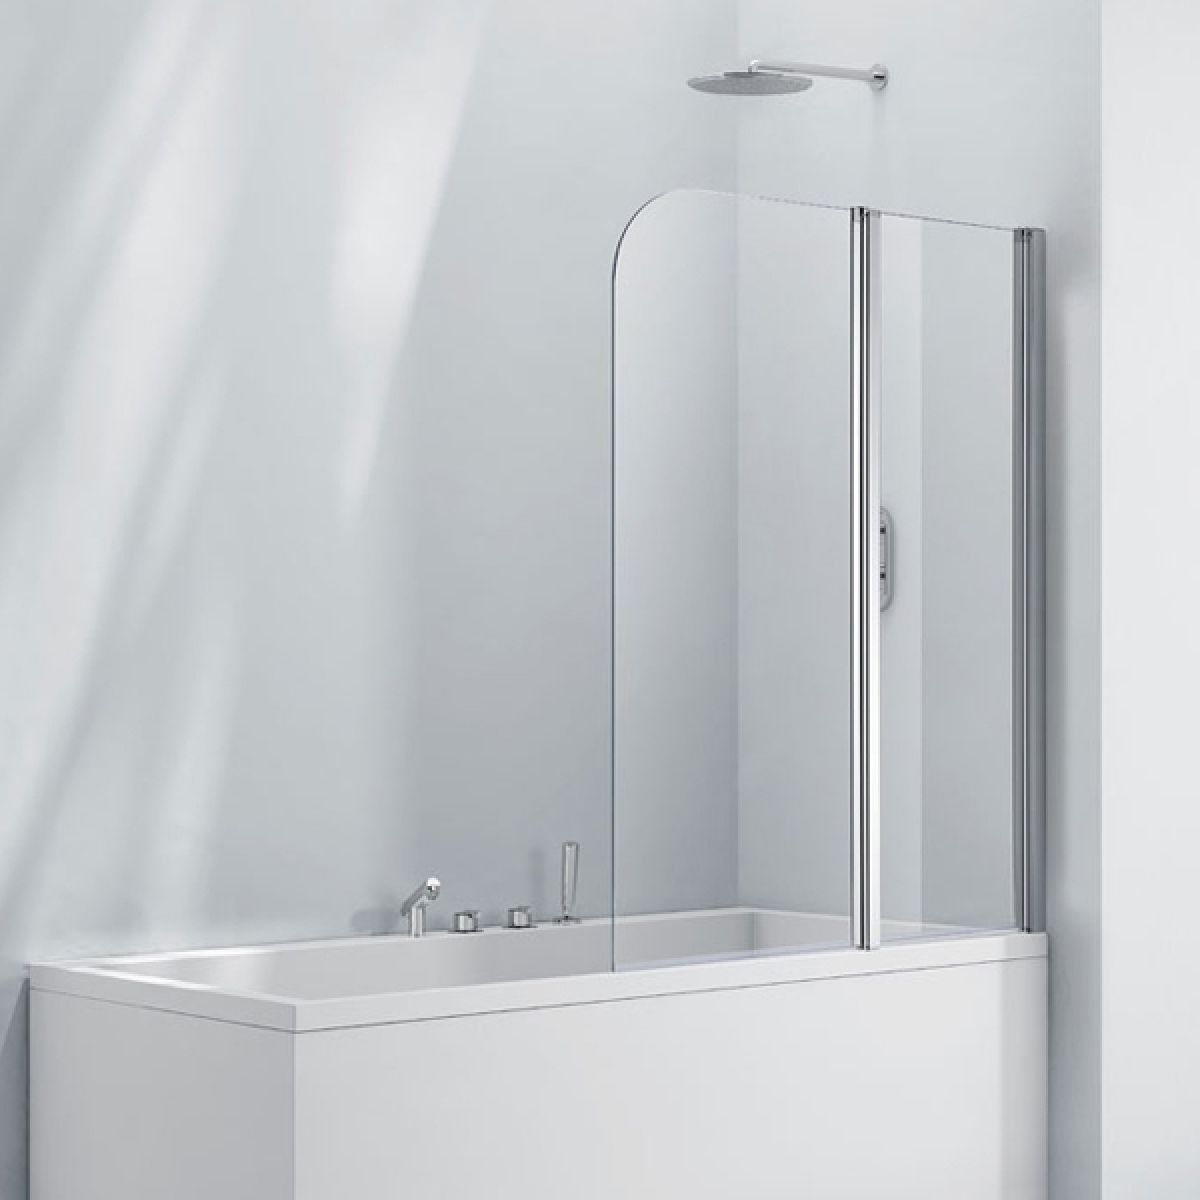 Frontline Aquaglass+ Double Folding Bath Screen